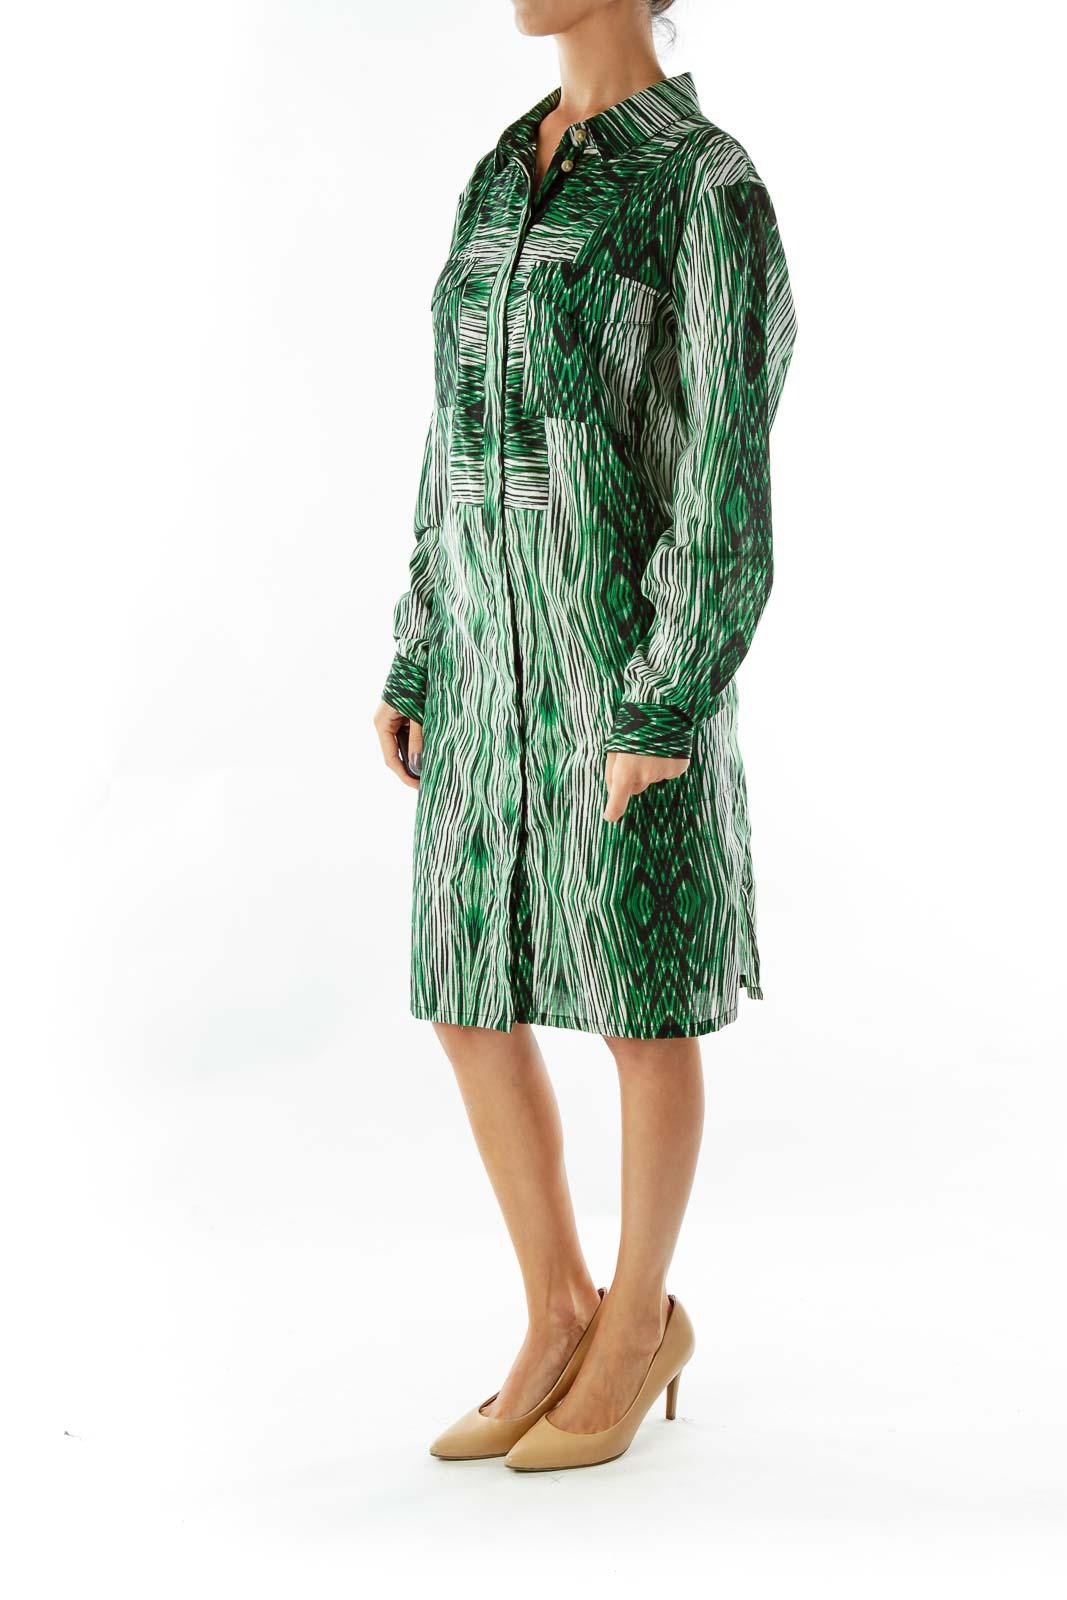 Green White Black Print Shirt Dress